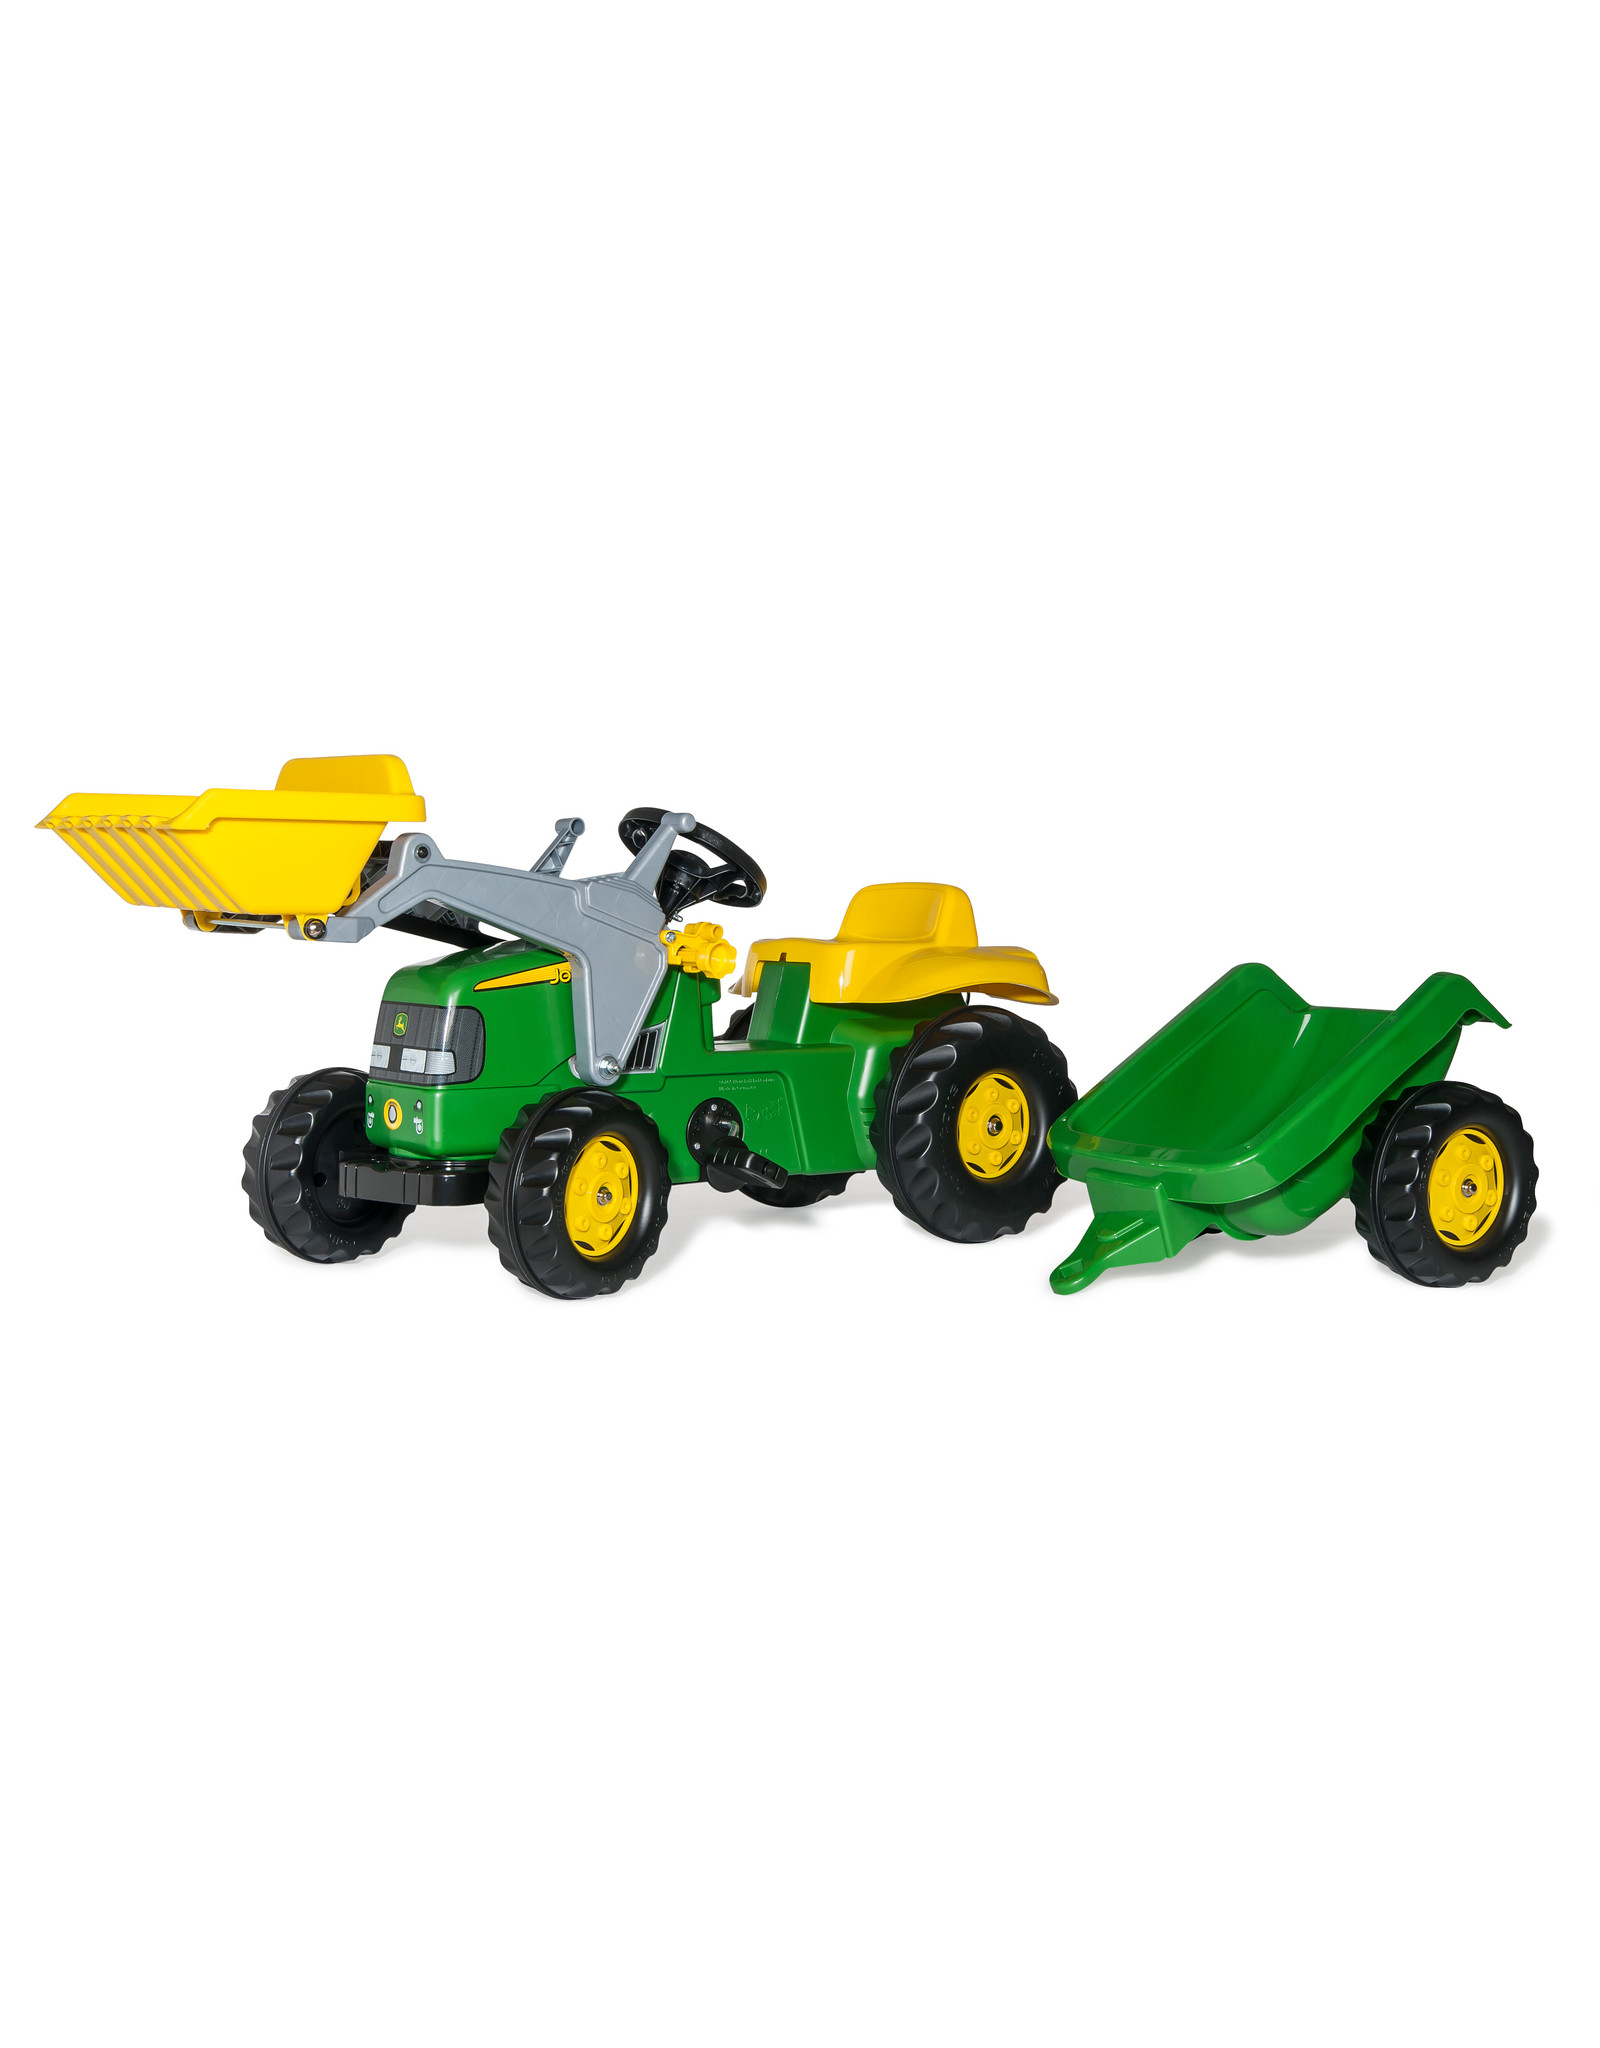 Rolly Toys Rolly toys Rollykid John deere 023110